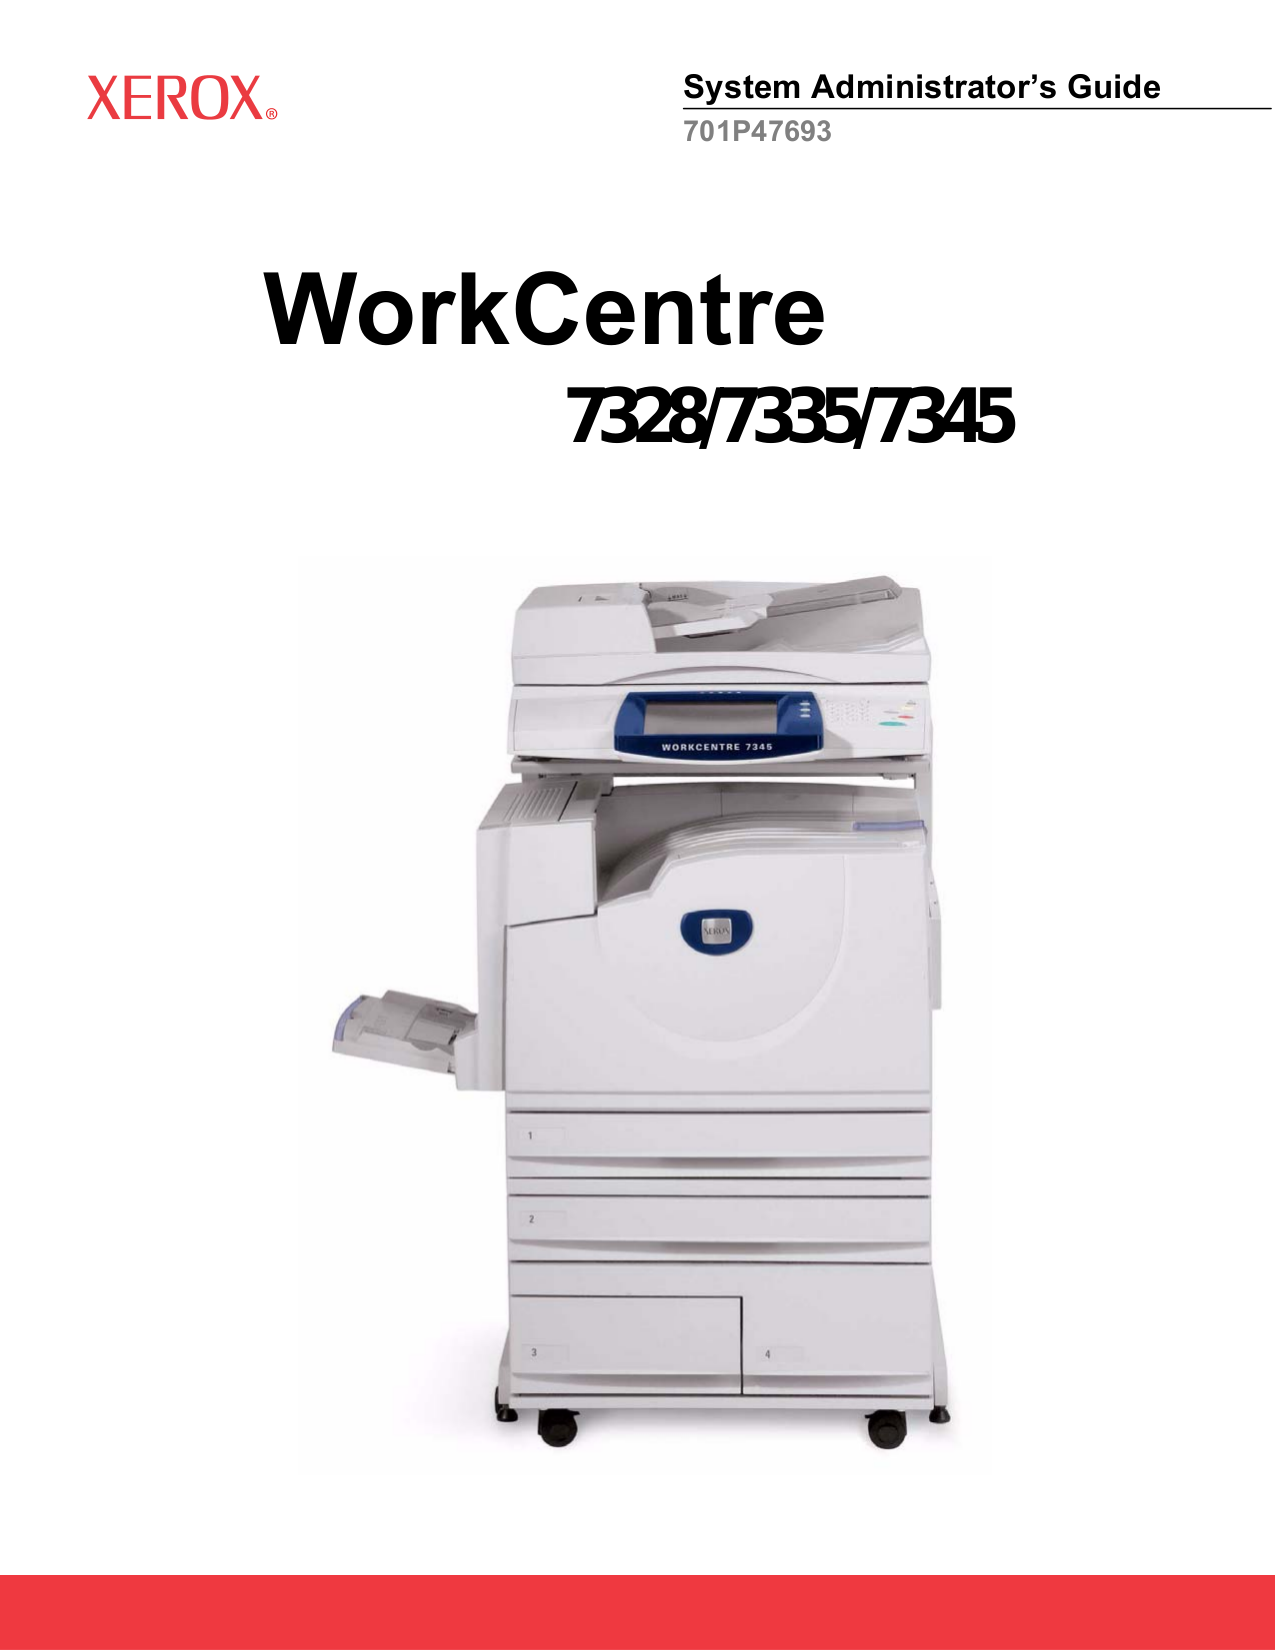 pdf for Xerox Multifunction Printer WorkCentre 7345 manual